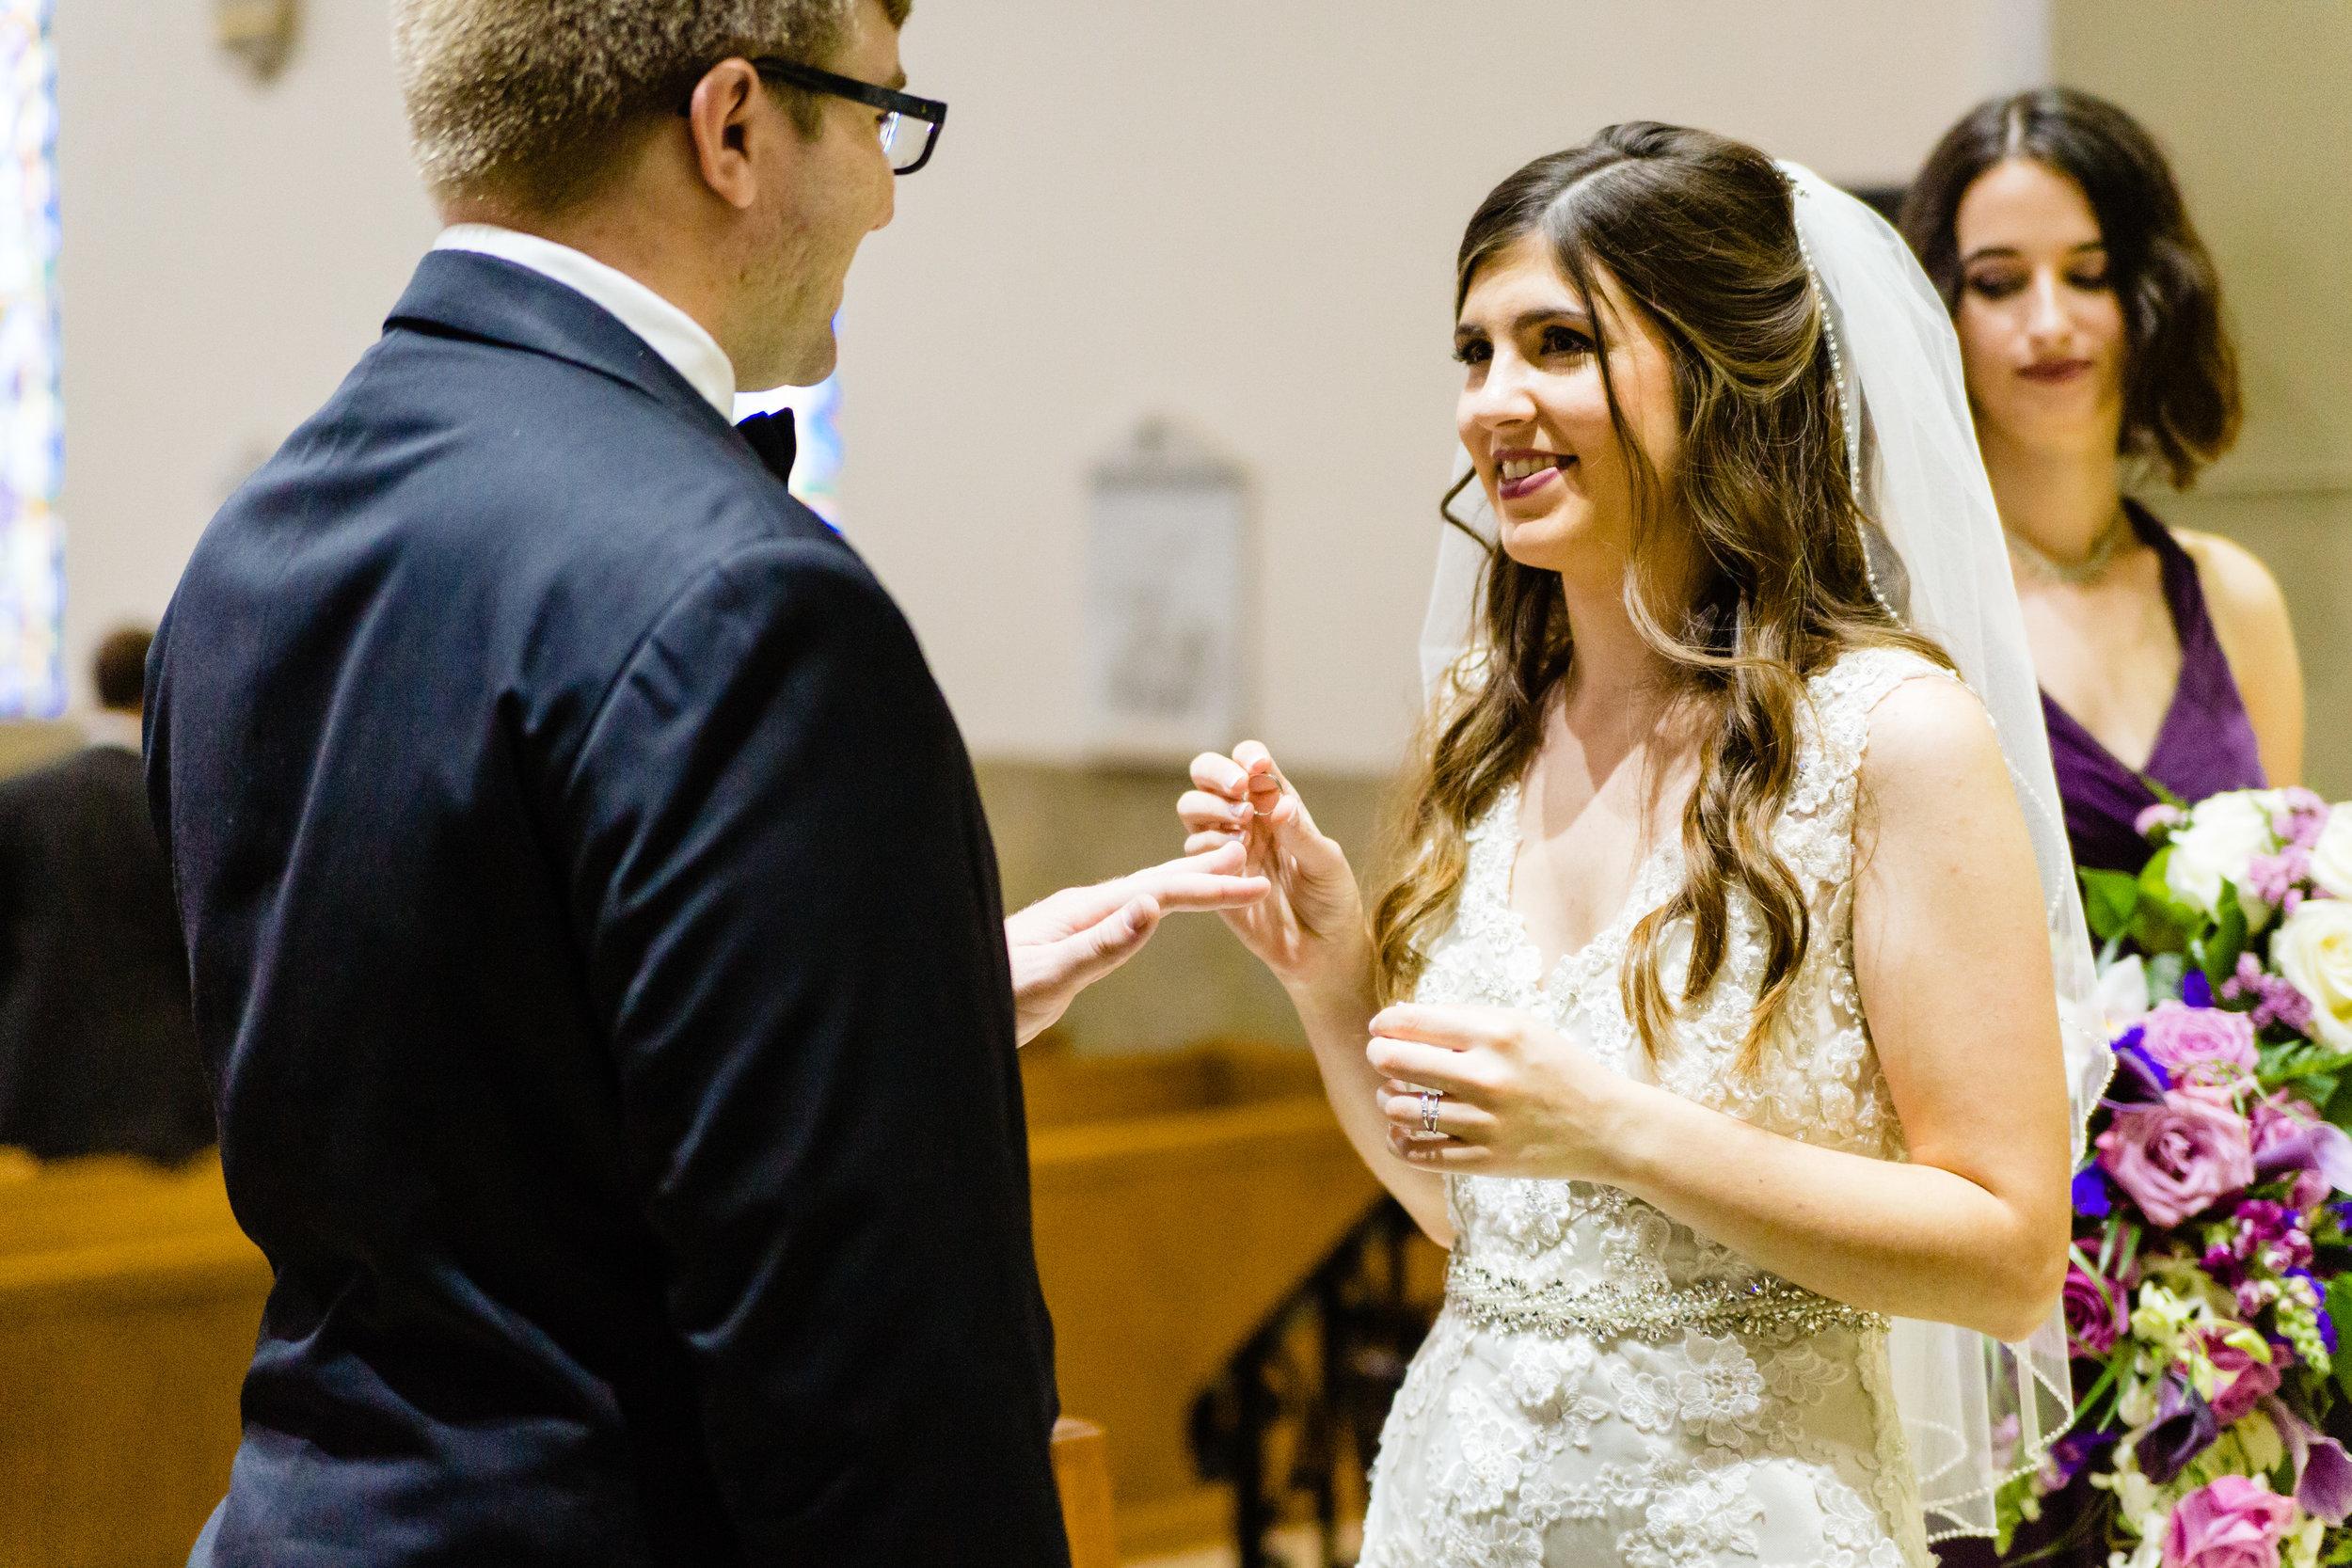 HAH_Zoe and Daniel_Clearwater Wedding_236_2018.jpg